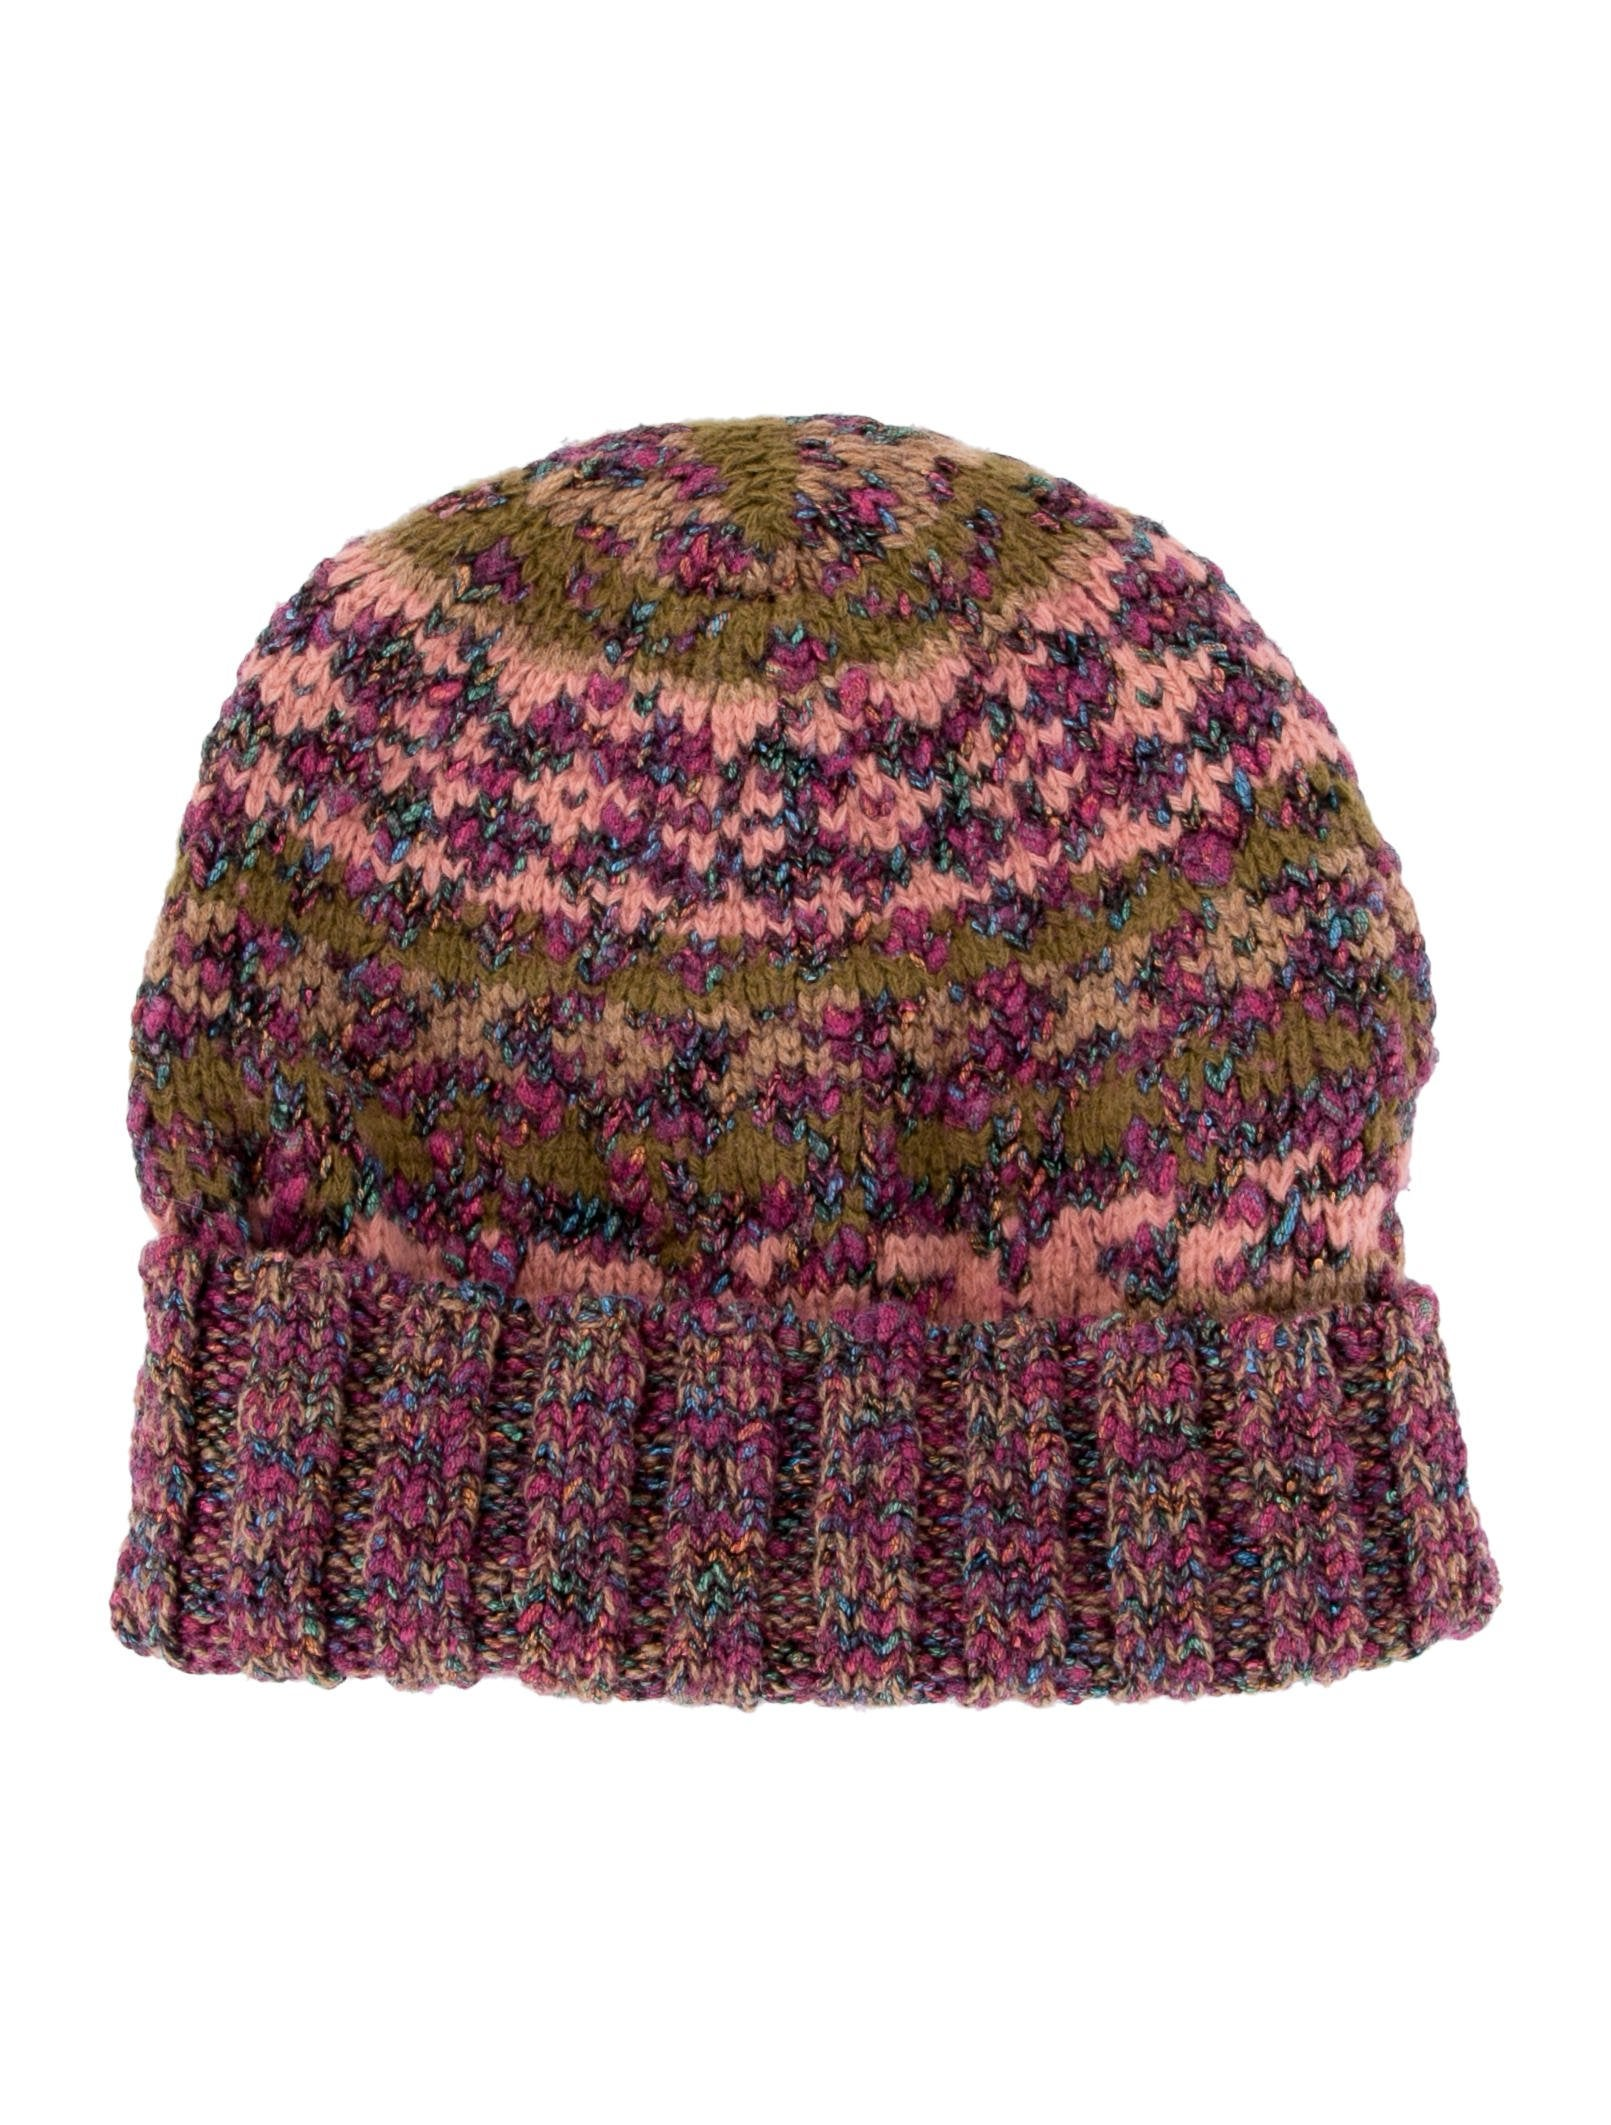 Chanel Multicolor Knit Beanie w  Tags - Accessories - CHA249866 ... 0224b79ca7c